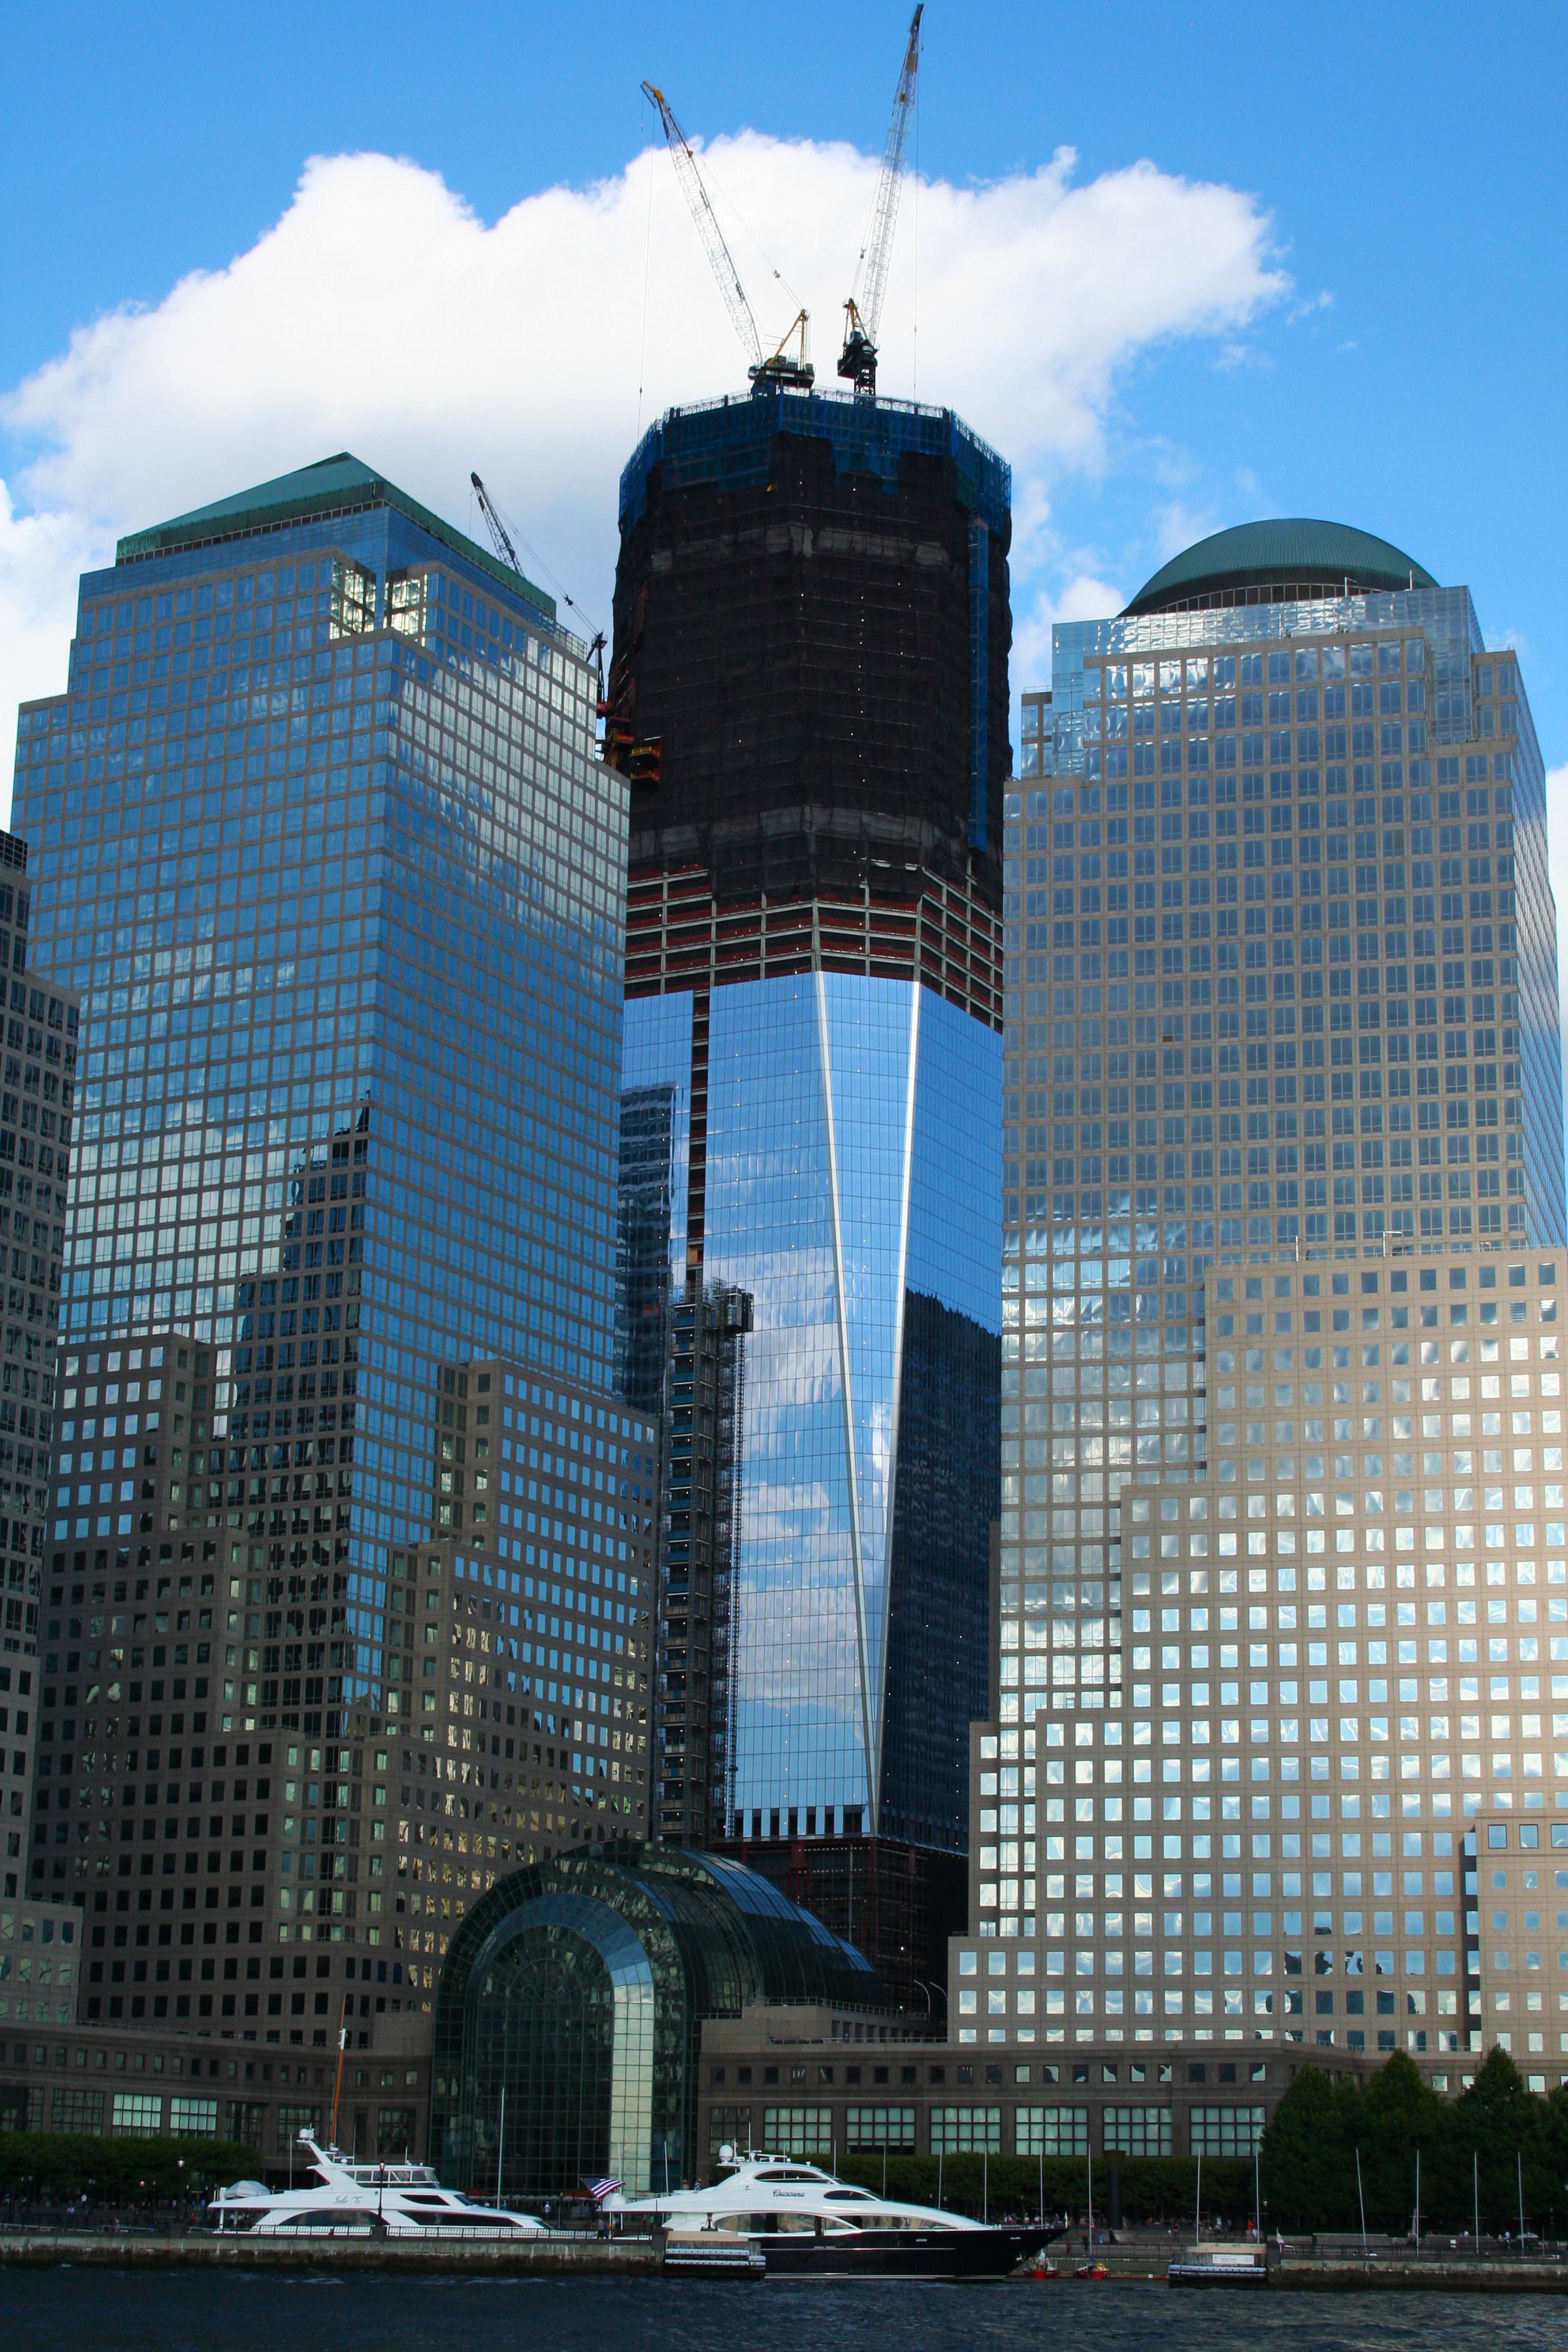 World Trade Center Construction : File world trade center under construction flickr